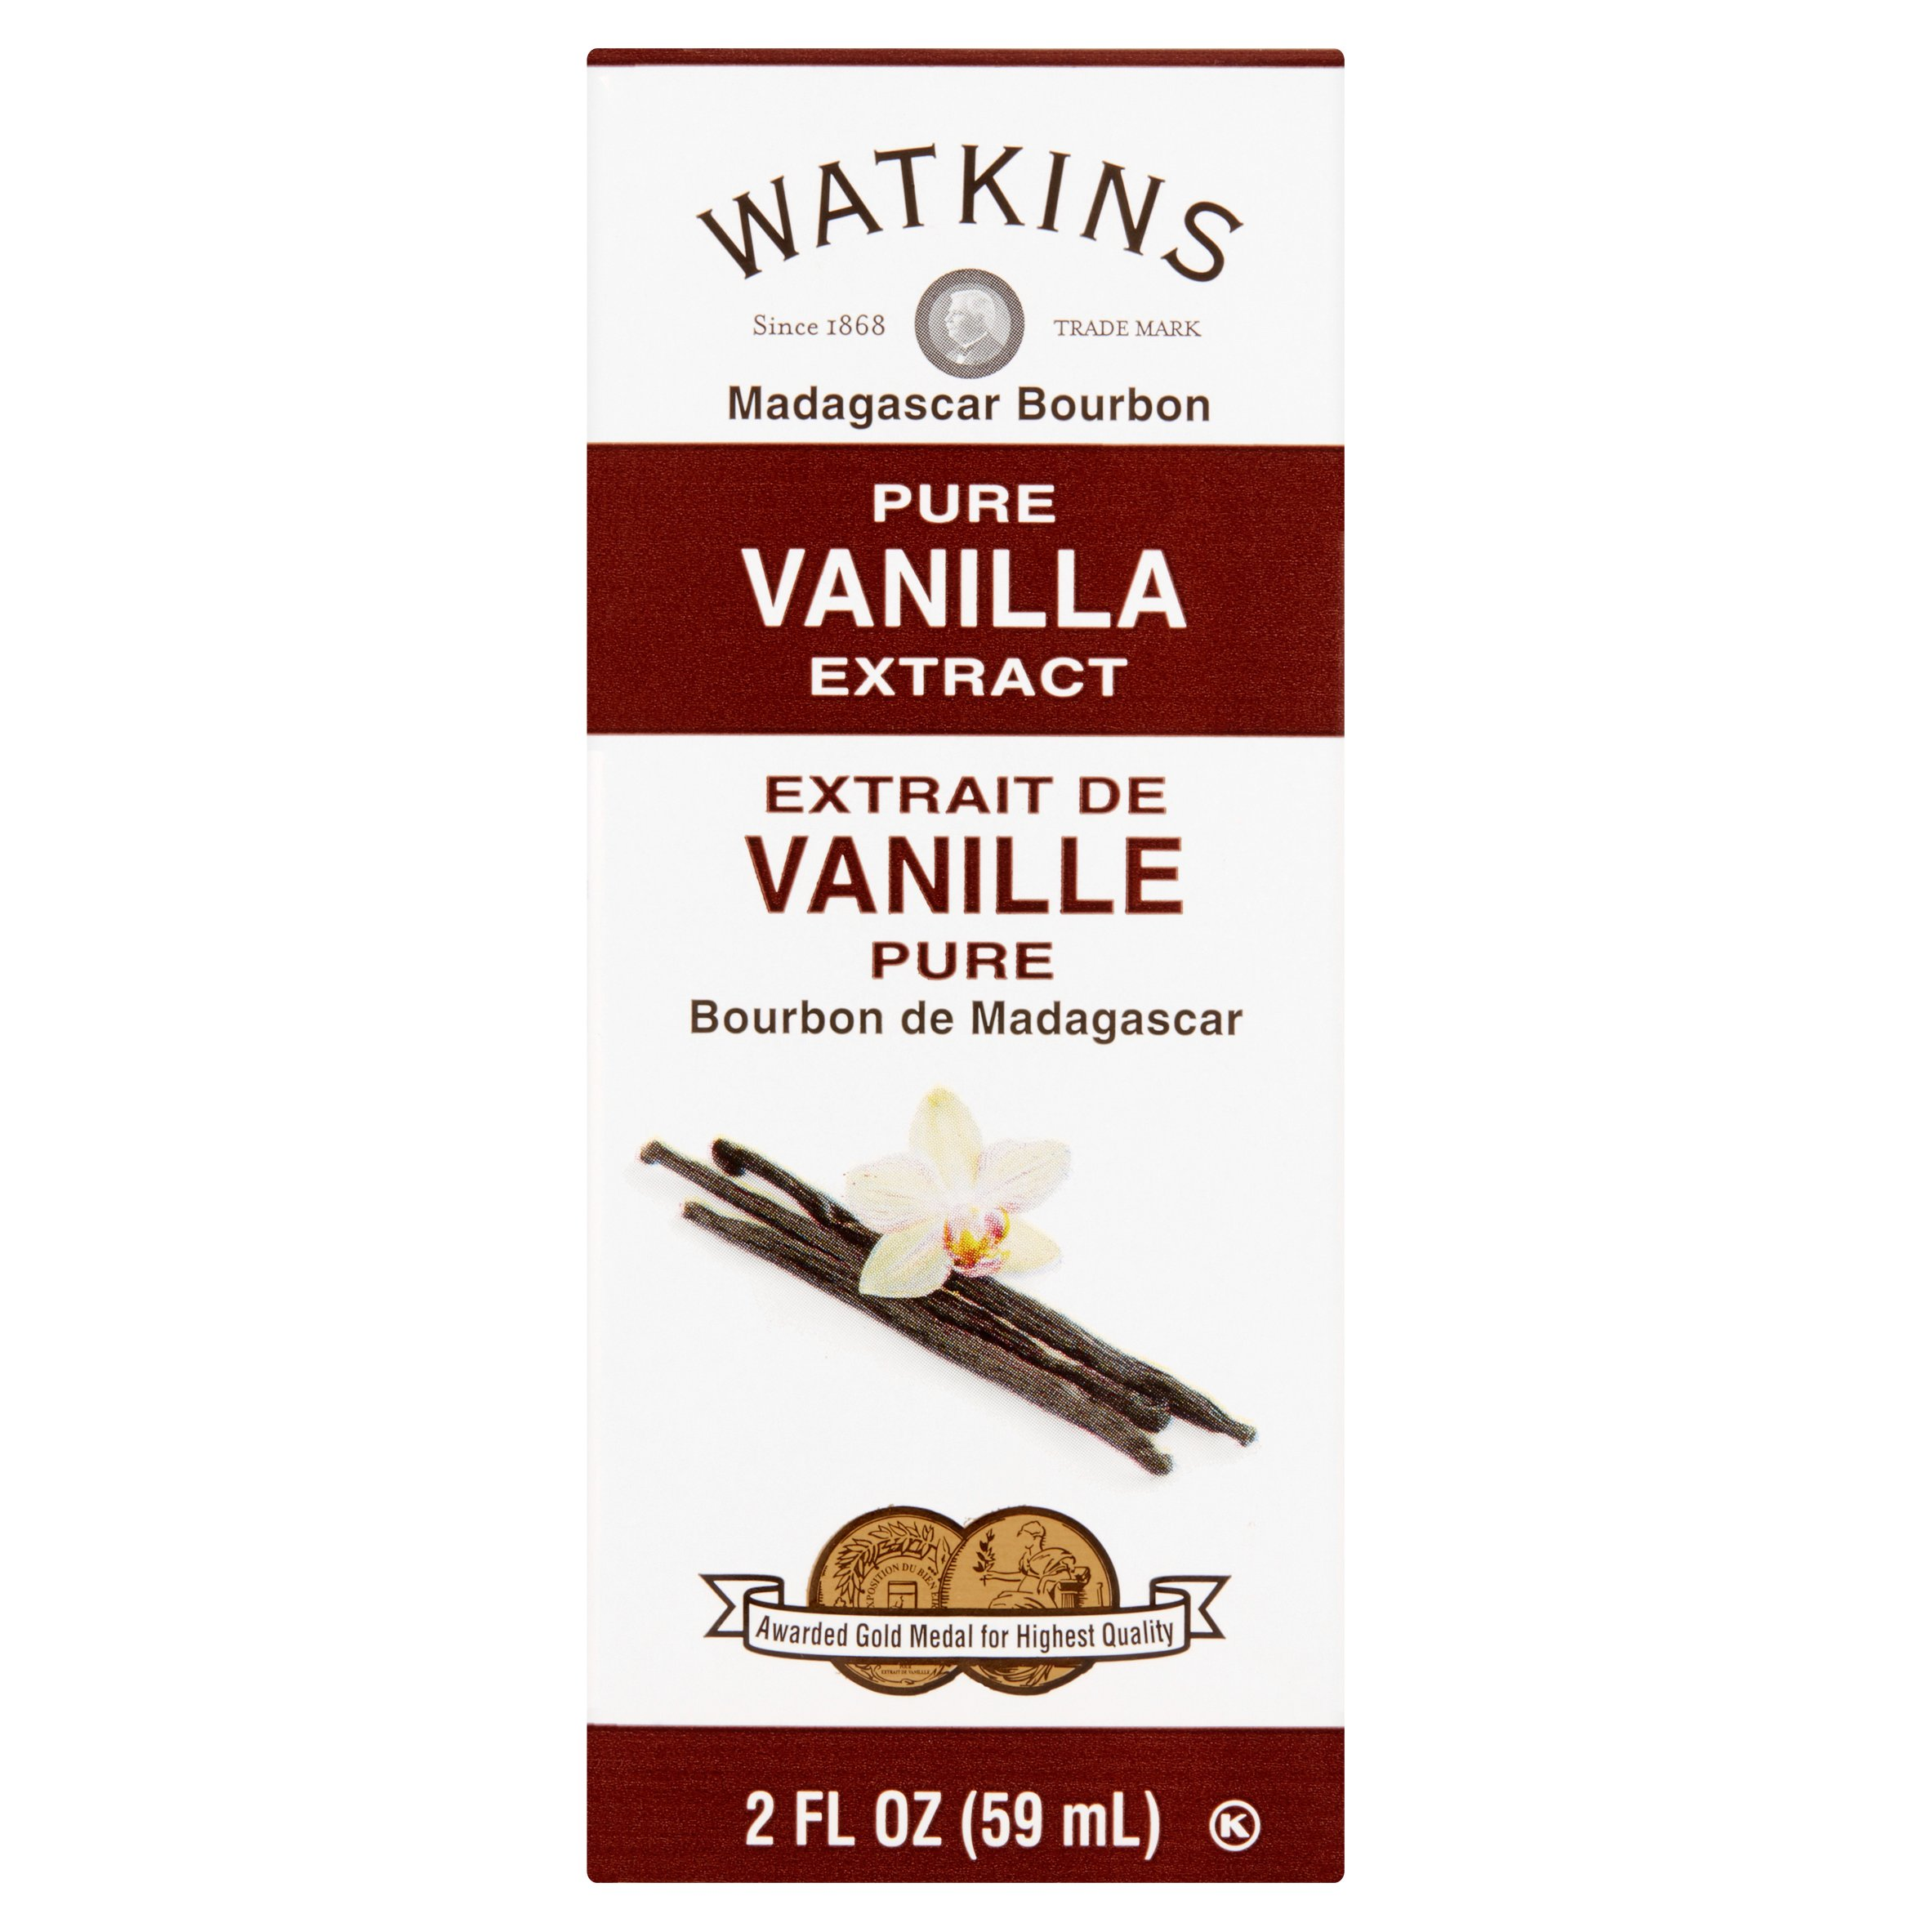 Watkins Madagascar Bourbon Pure Vanilla Extract Coffee Creamer, 2 fl oz, 6 pack